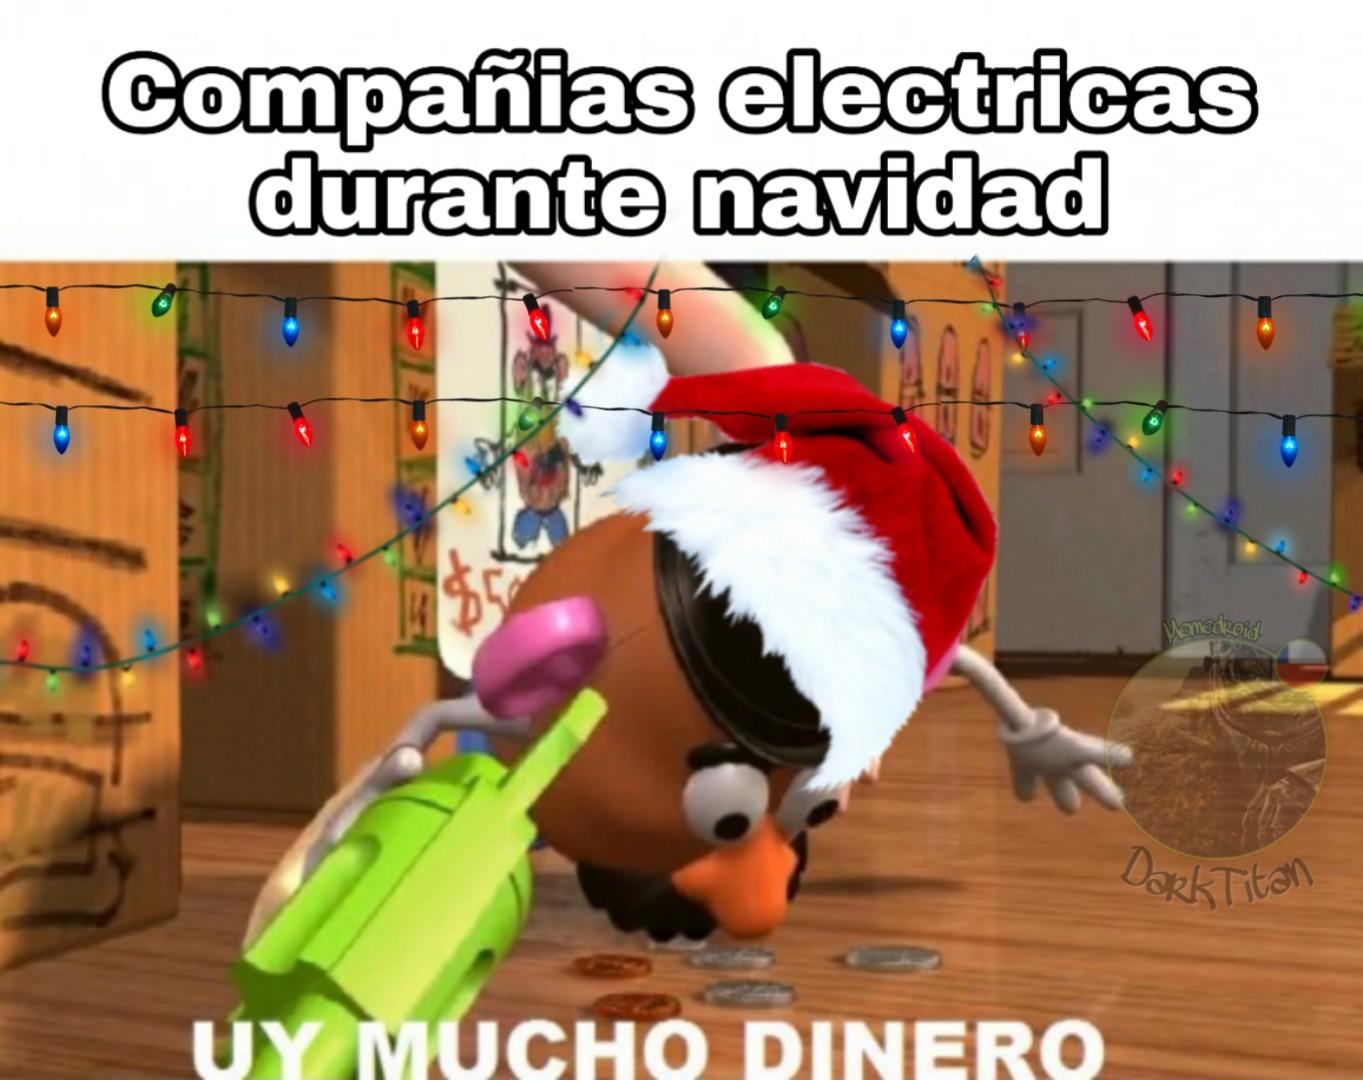 Feliz navidas a todos :) - meme